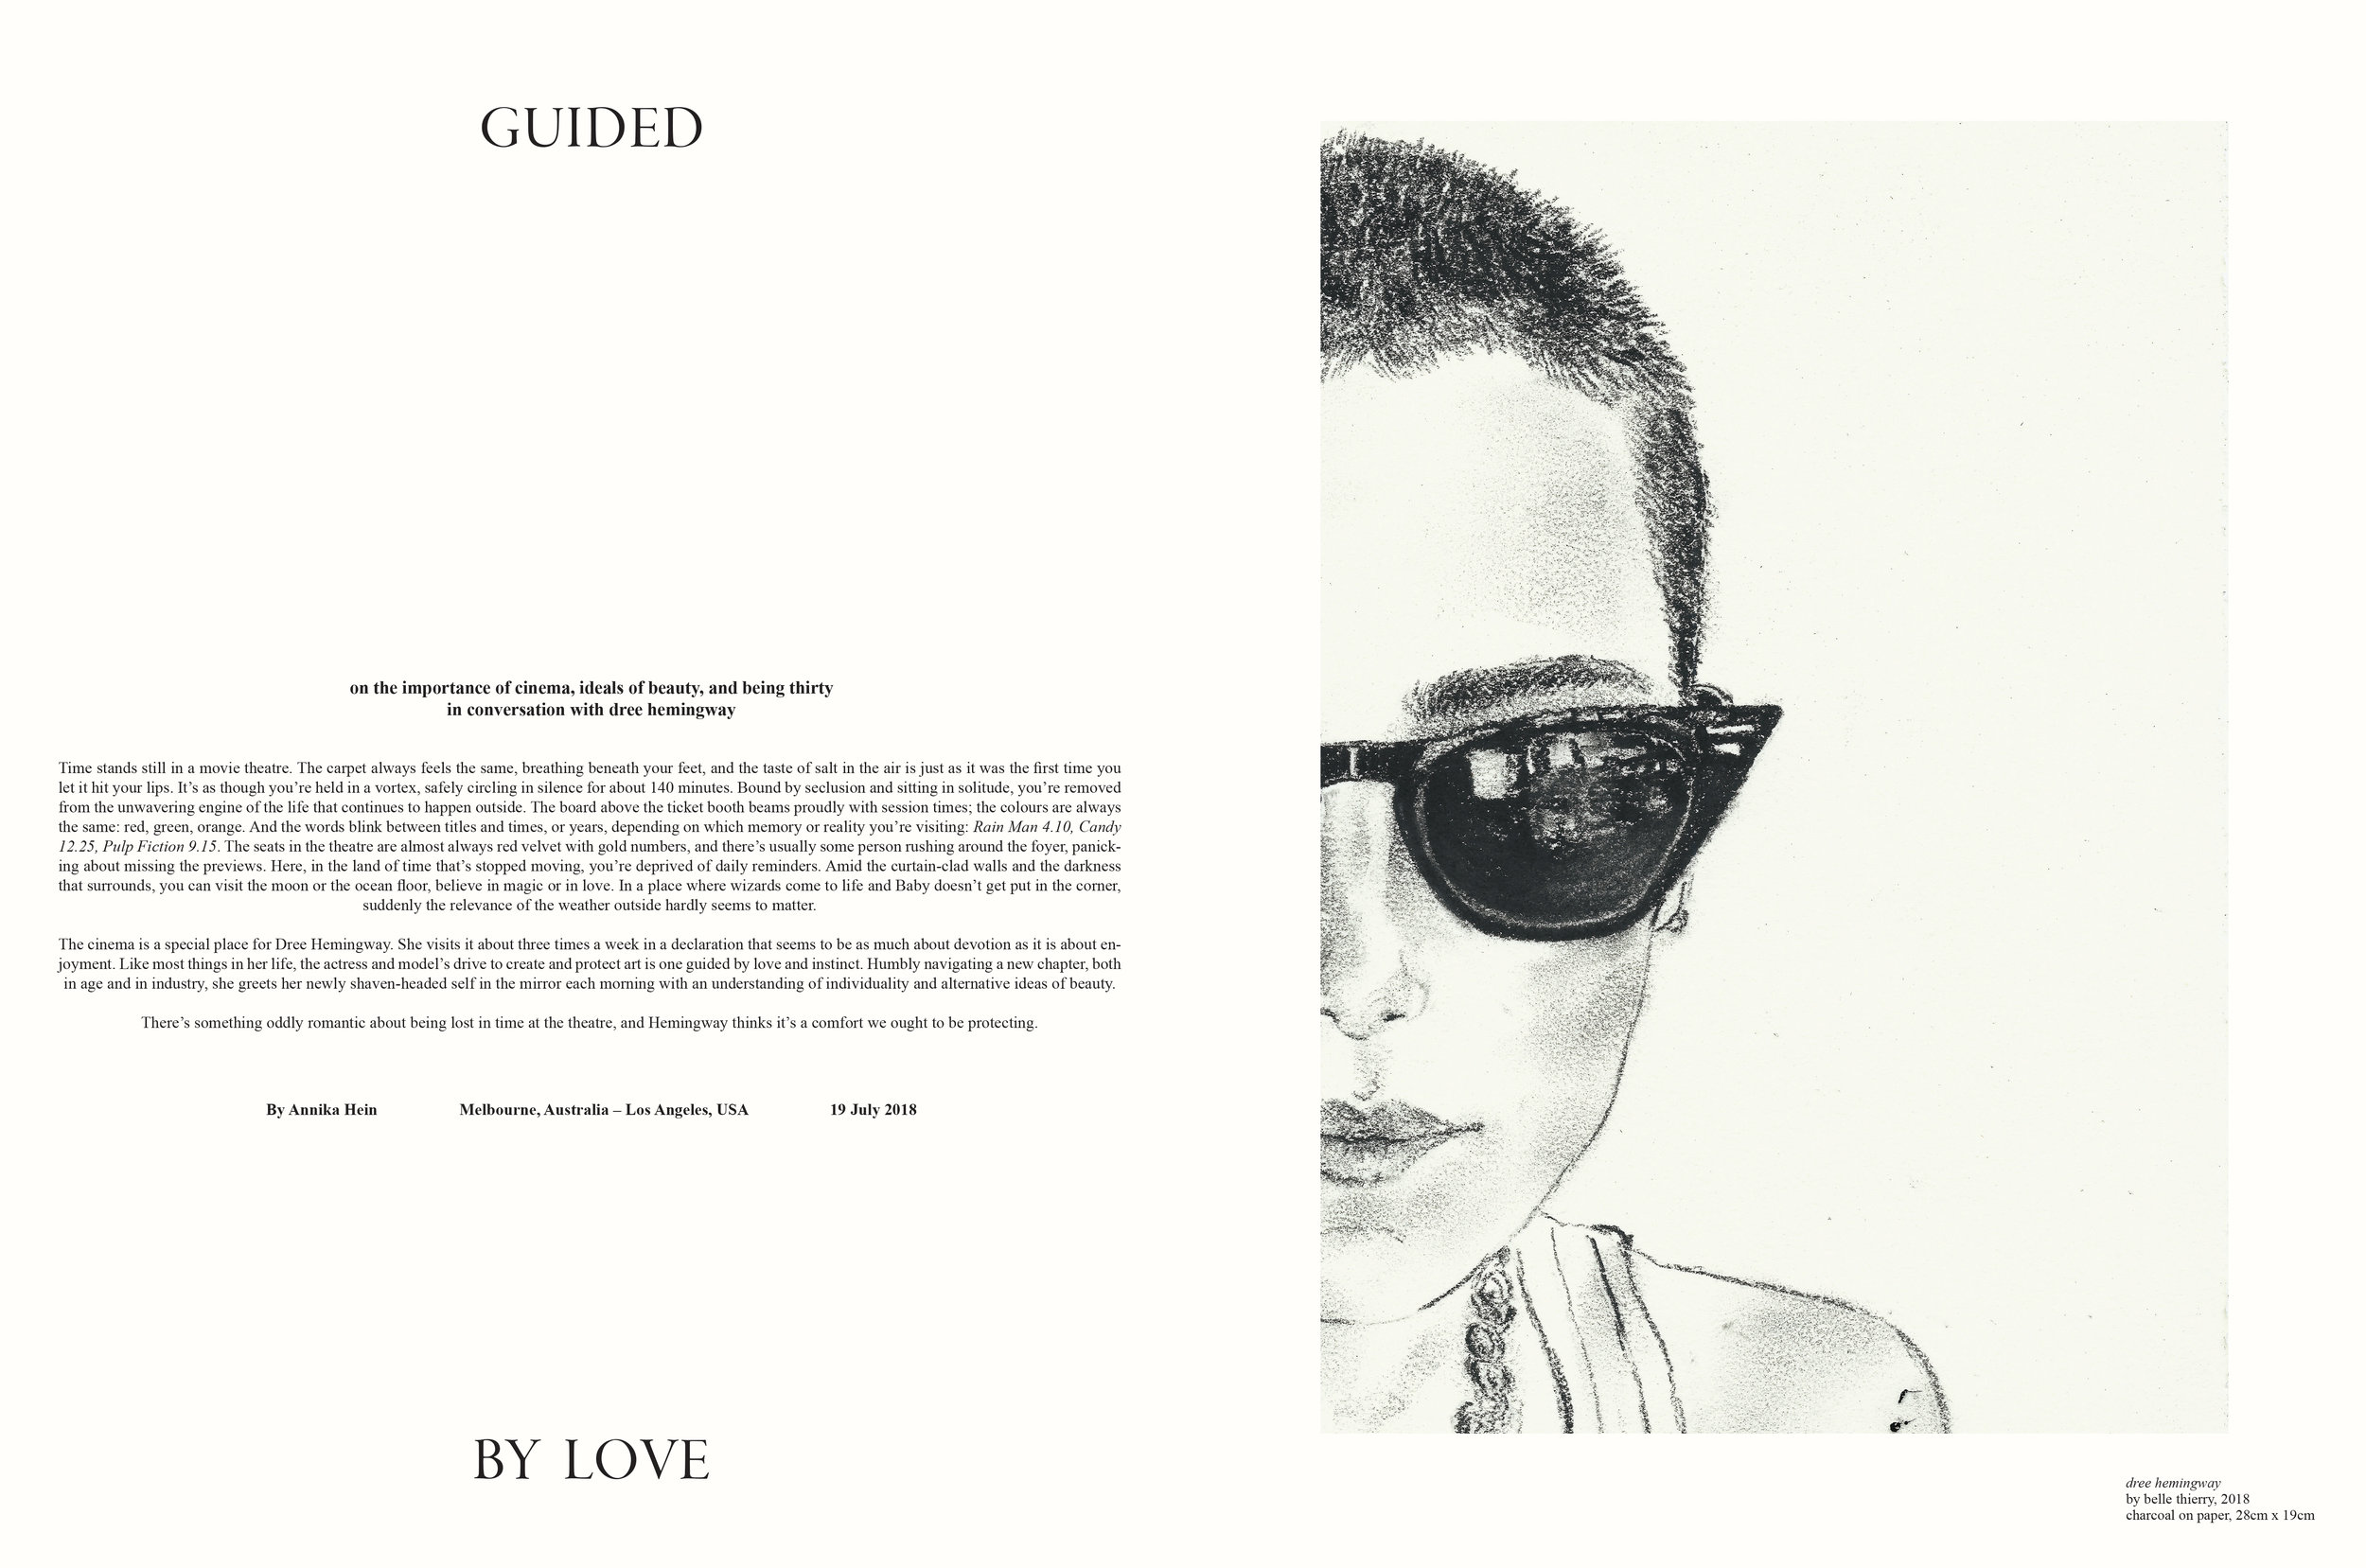 Guided by love - Dree-1.jpg